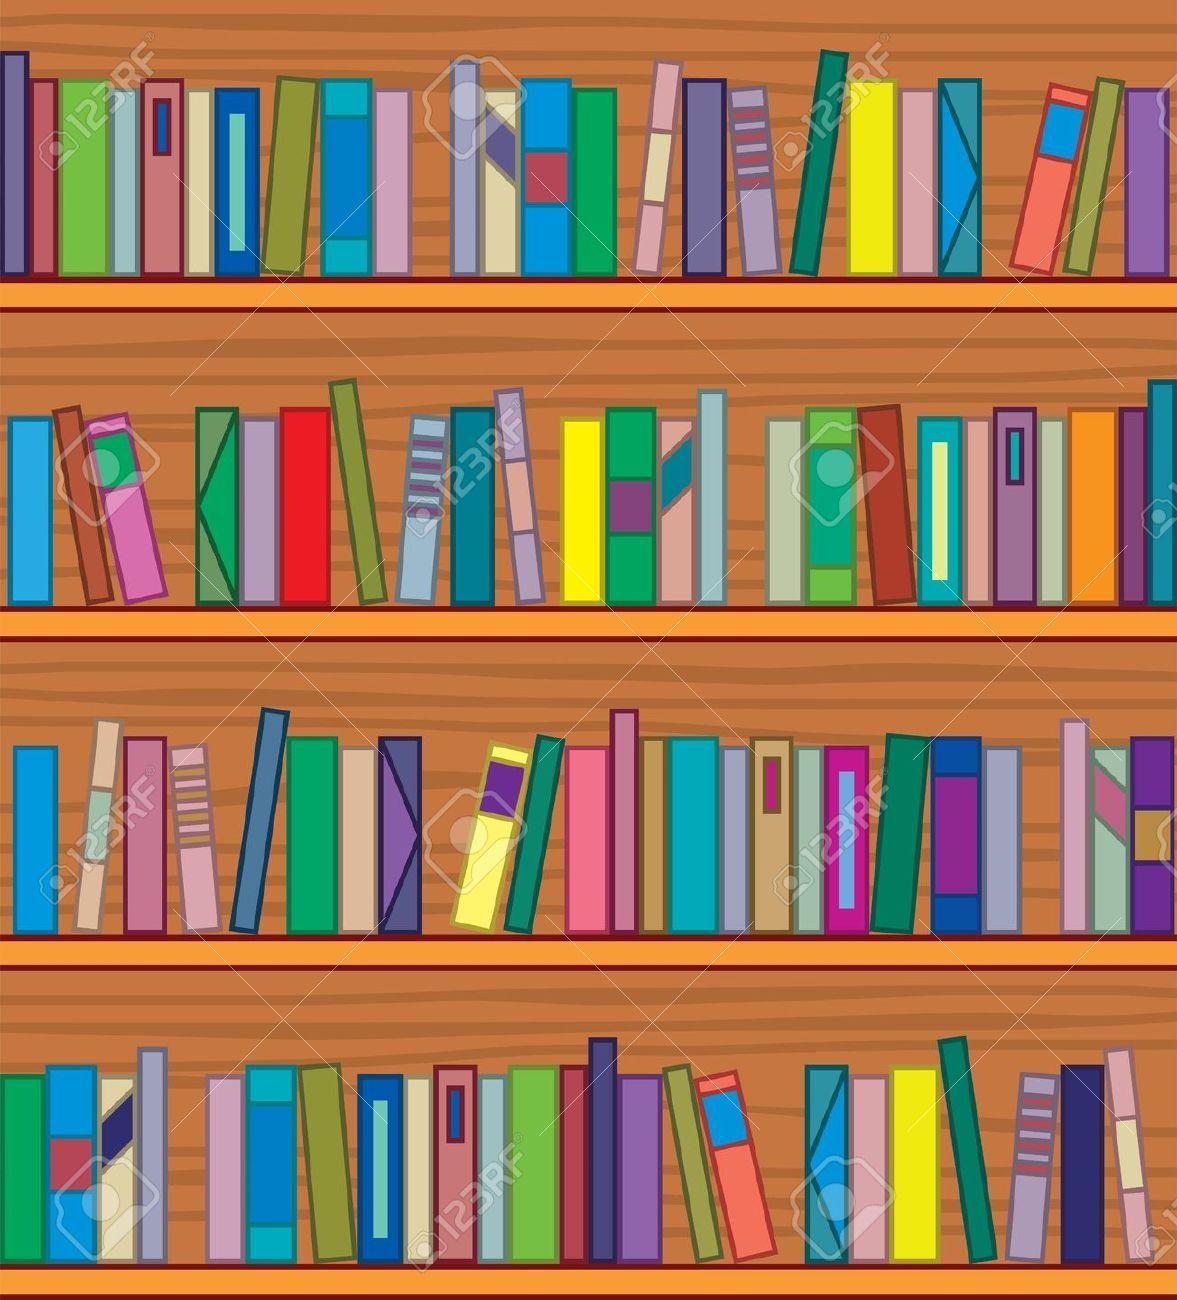 Bookshelf clipart background. Library shelf clipartxtras teacher